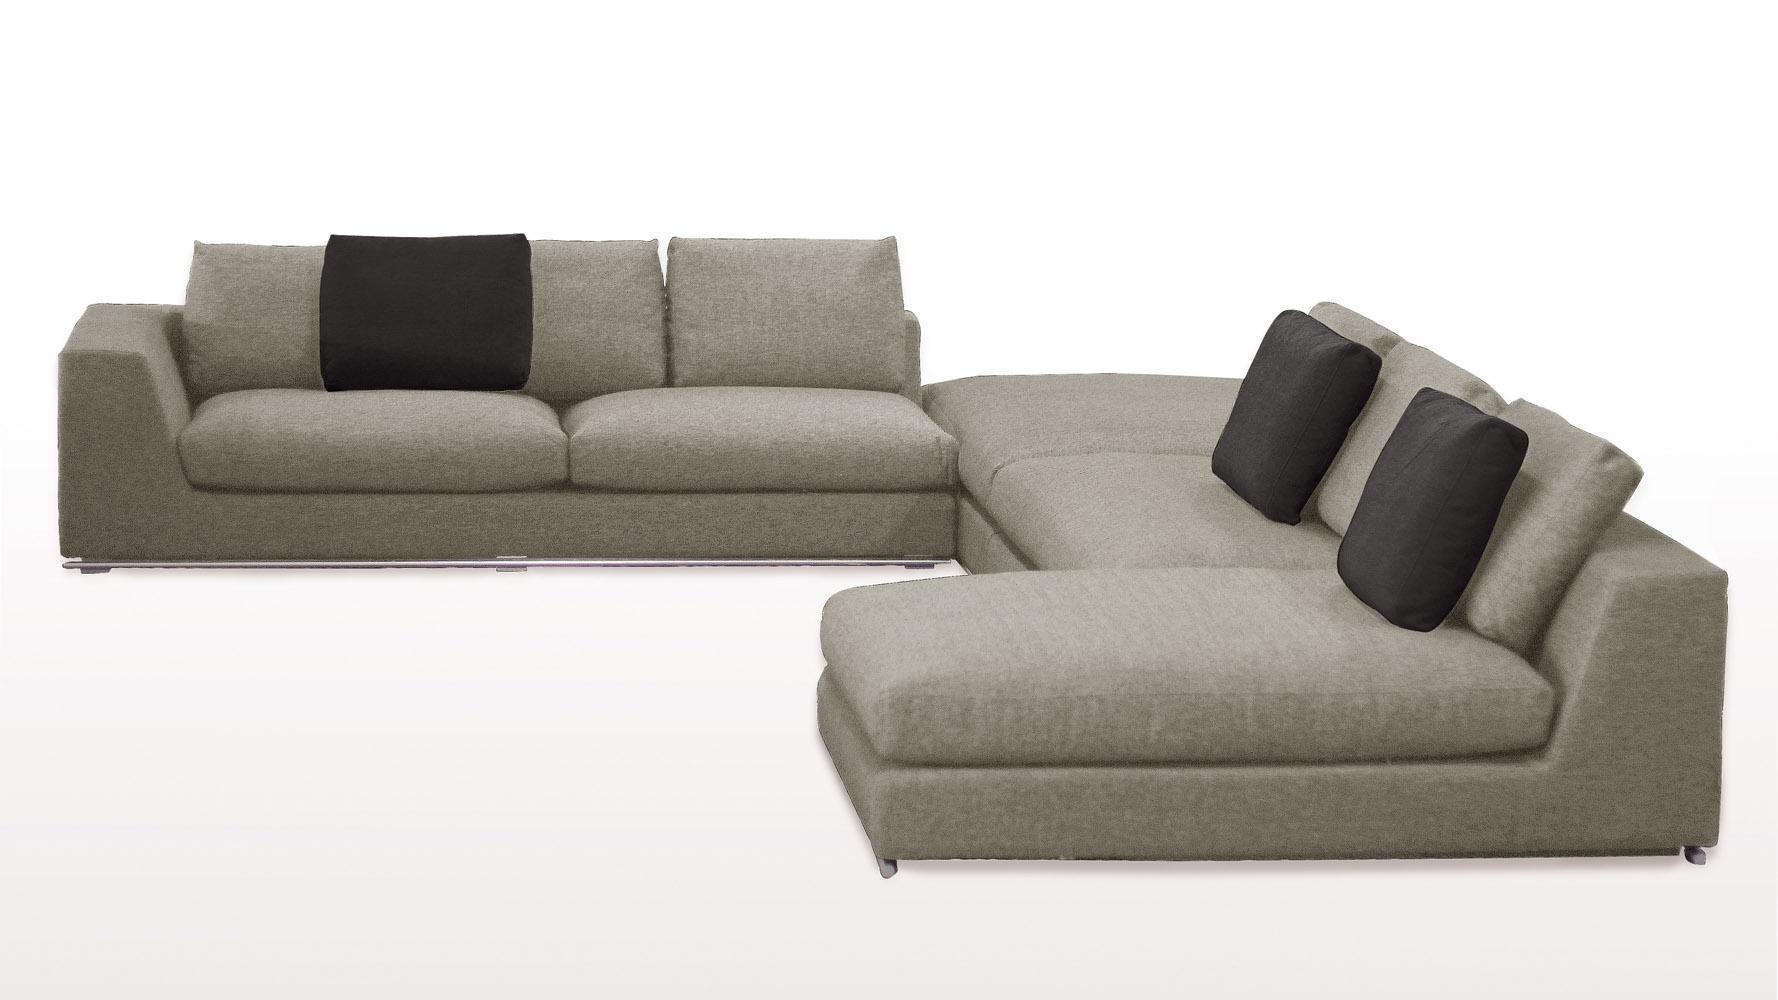 Comodo Sectional Sofa With Ottoman – Grey | Zuri Furniture Regarding Armless Sectional Sofas (View 3 of 15)